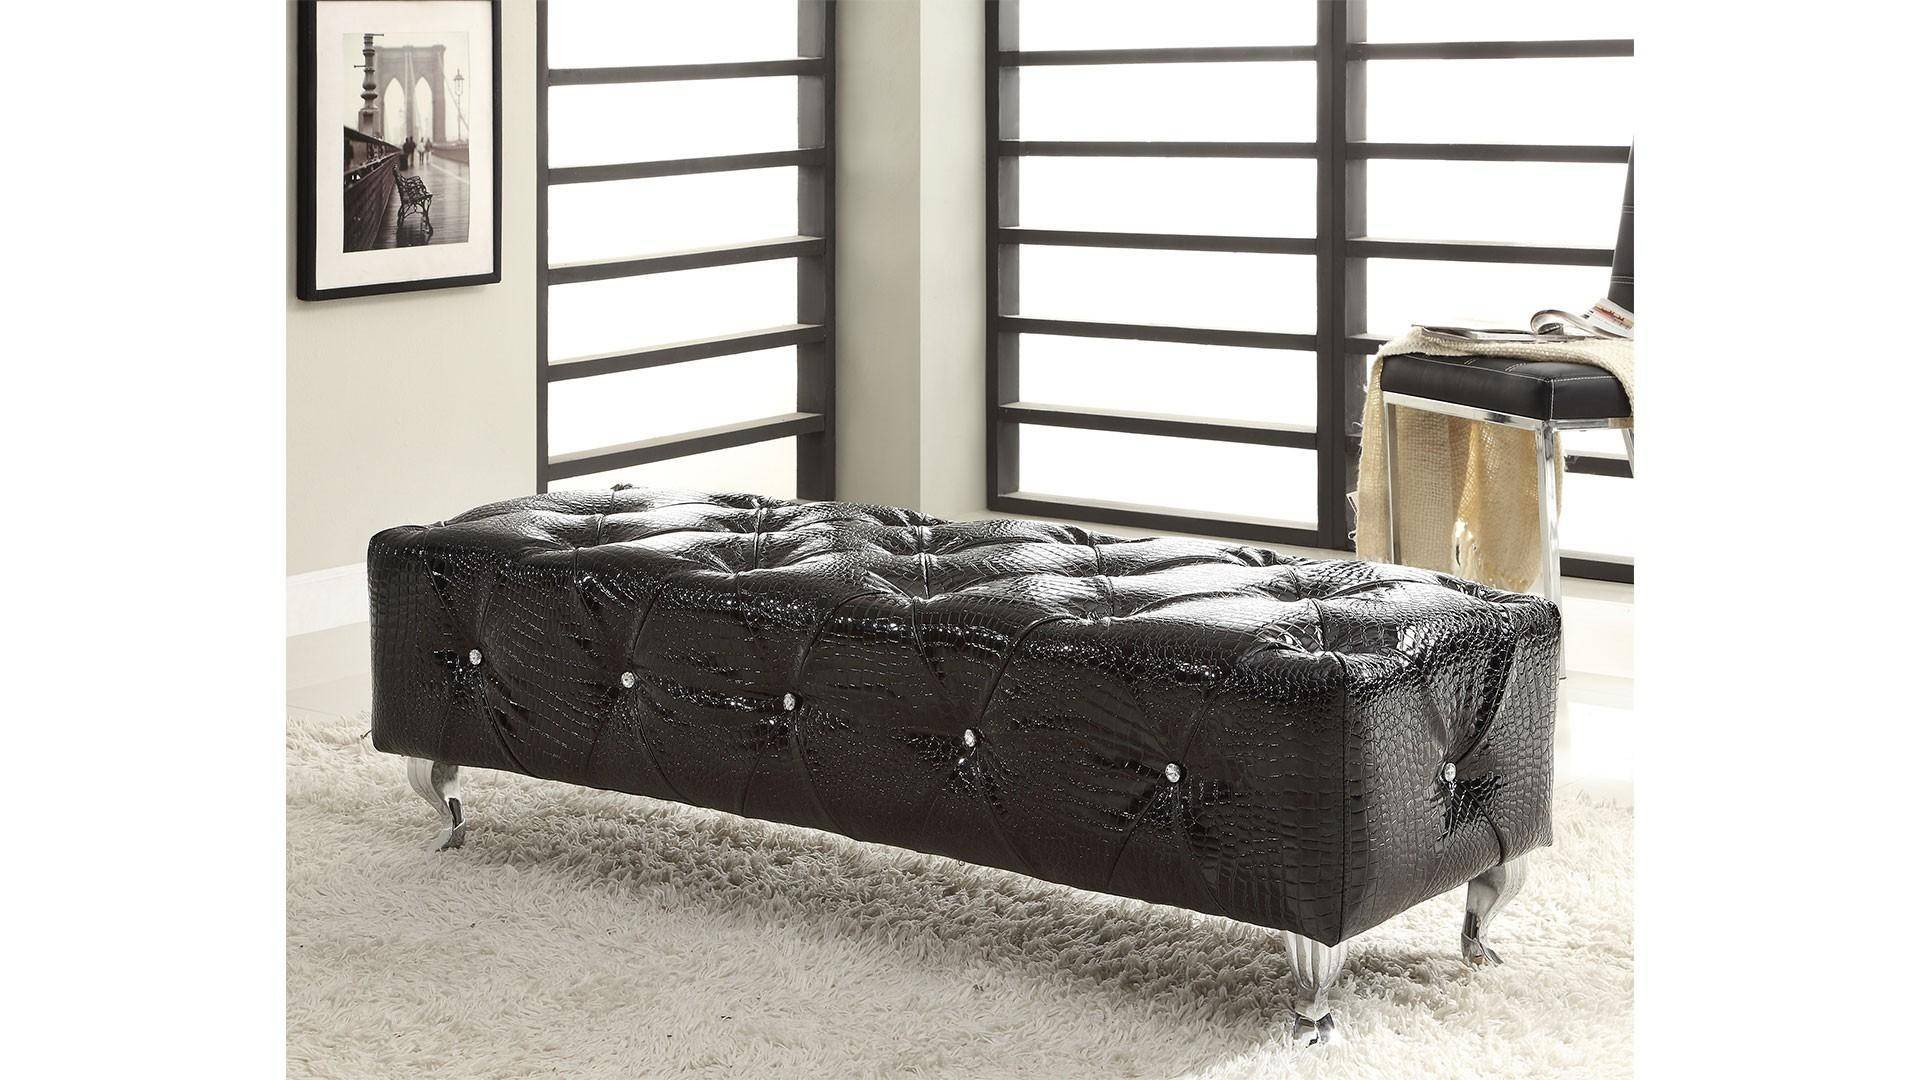 Home Furniture Bedroom Set Beautiful at Home Michelle King Platform Bedroom Set 2 Pcs In Black Leather